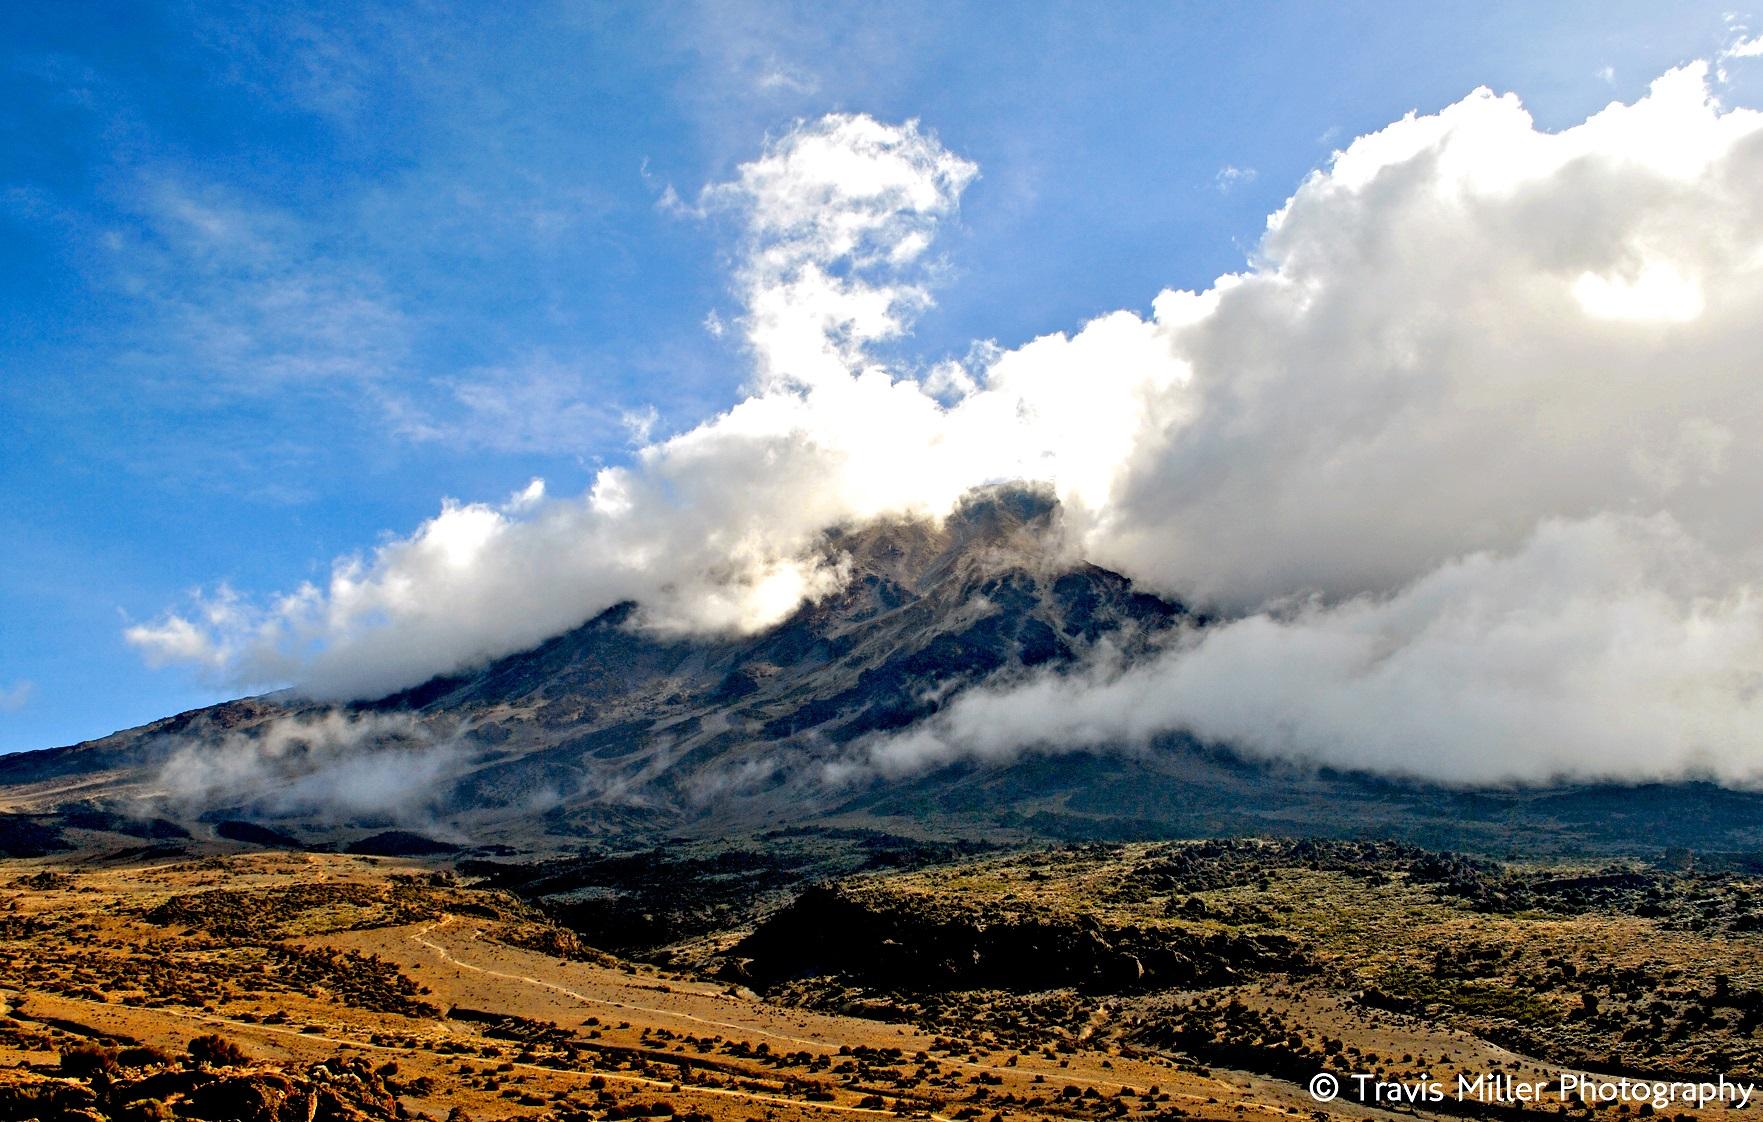 Engulfed /  Mount Kilimanjaro, Tanzania